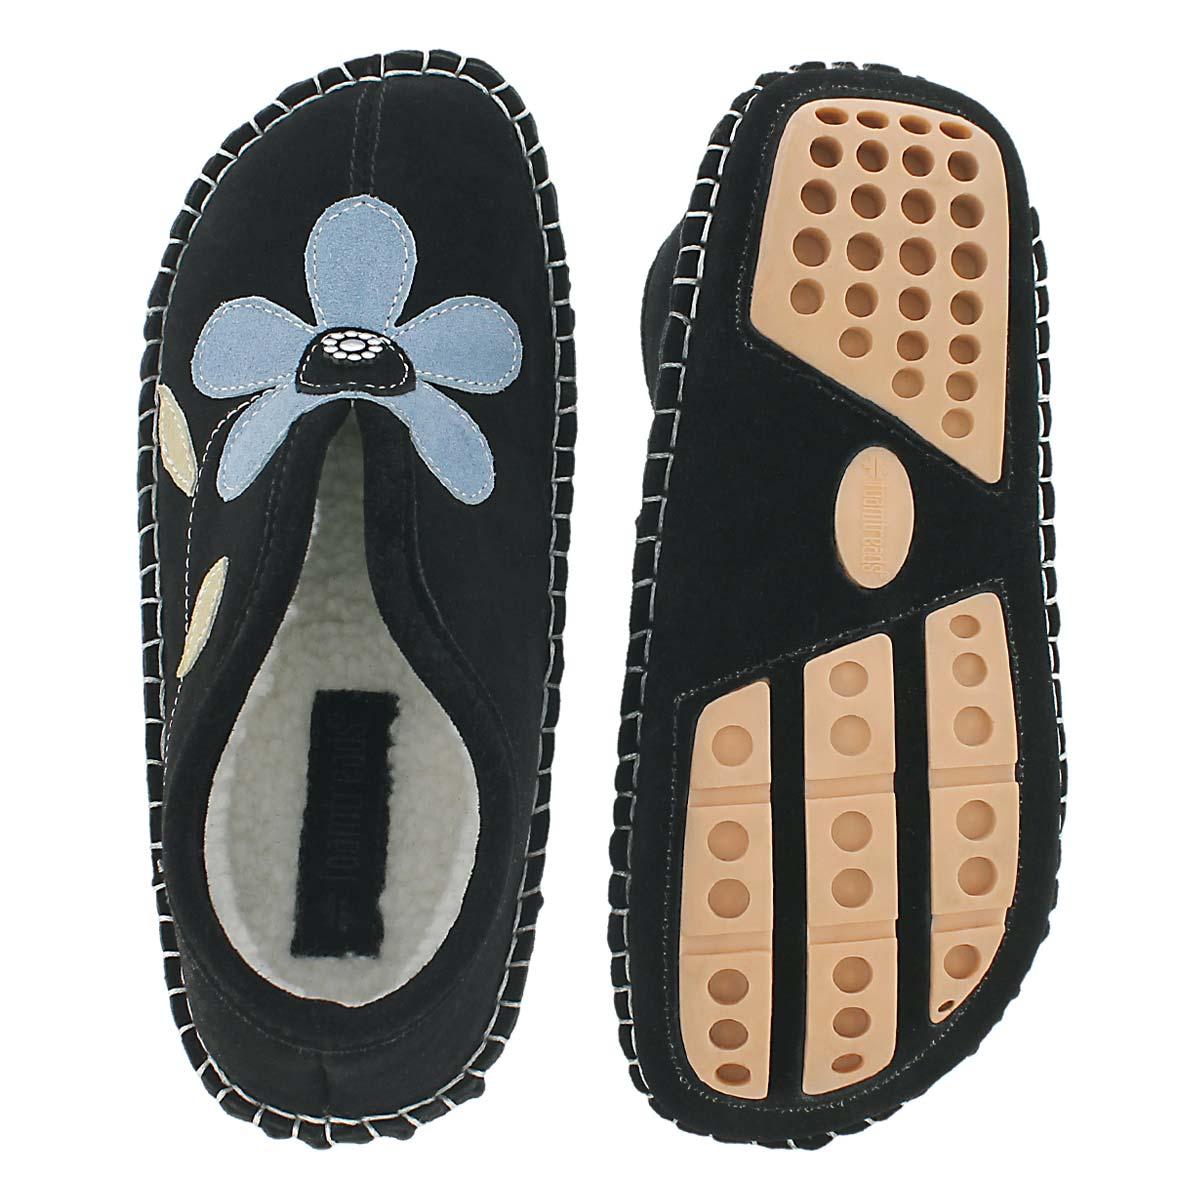 Lds Ophys black suede slipper